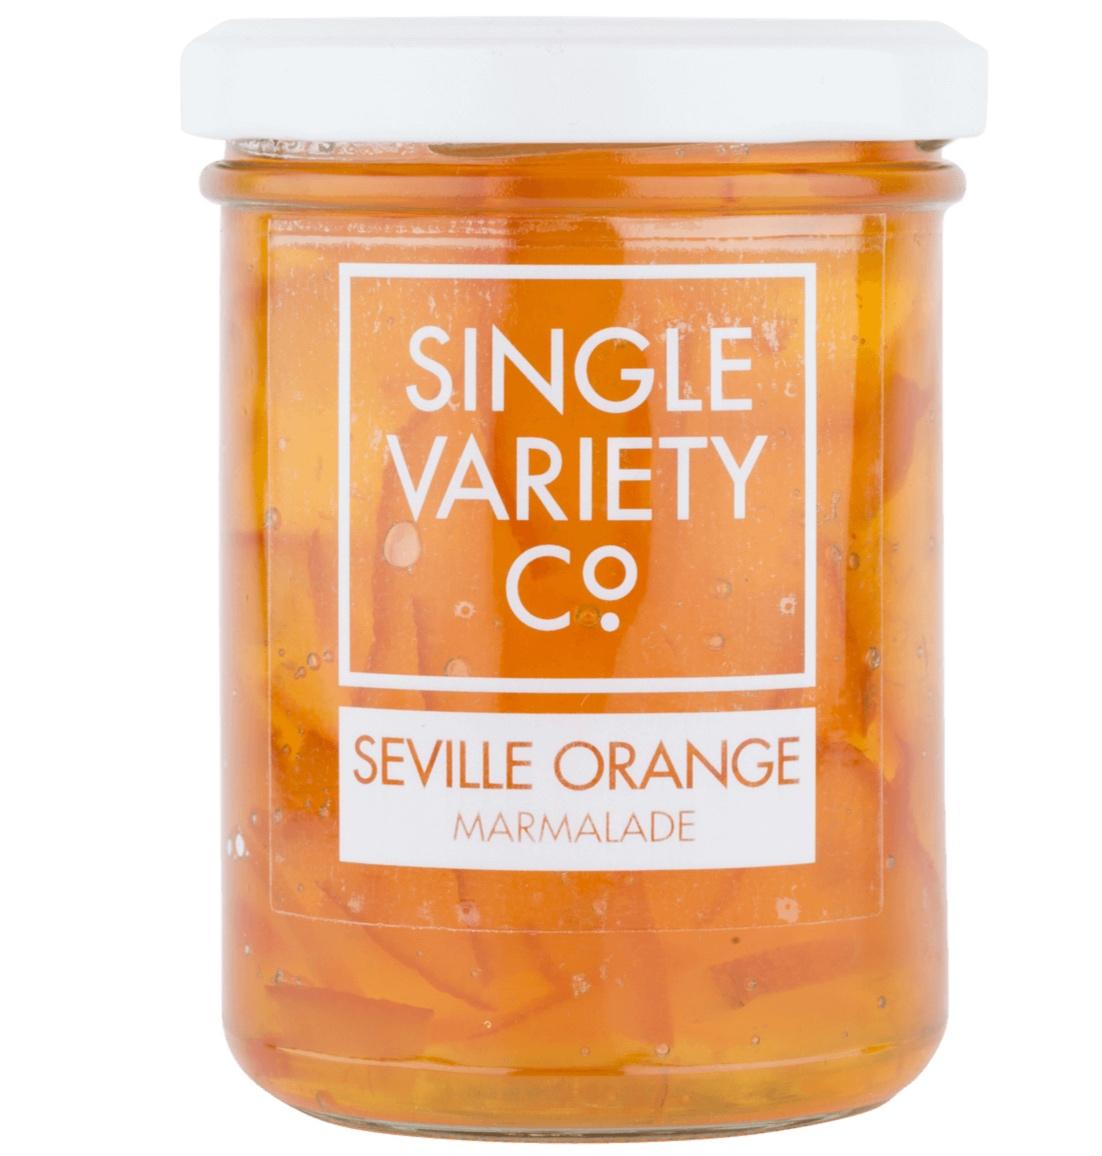 seville++orange+marmalade